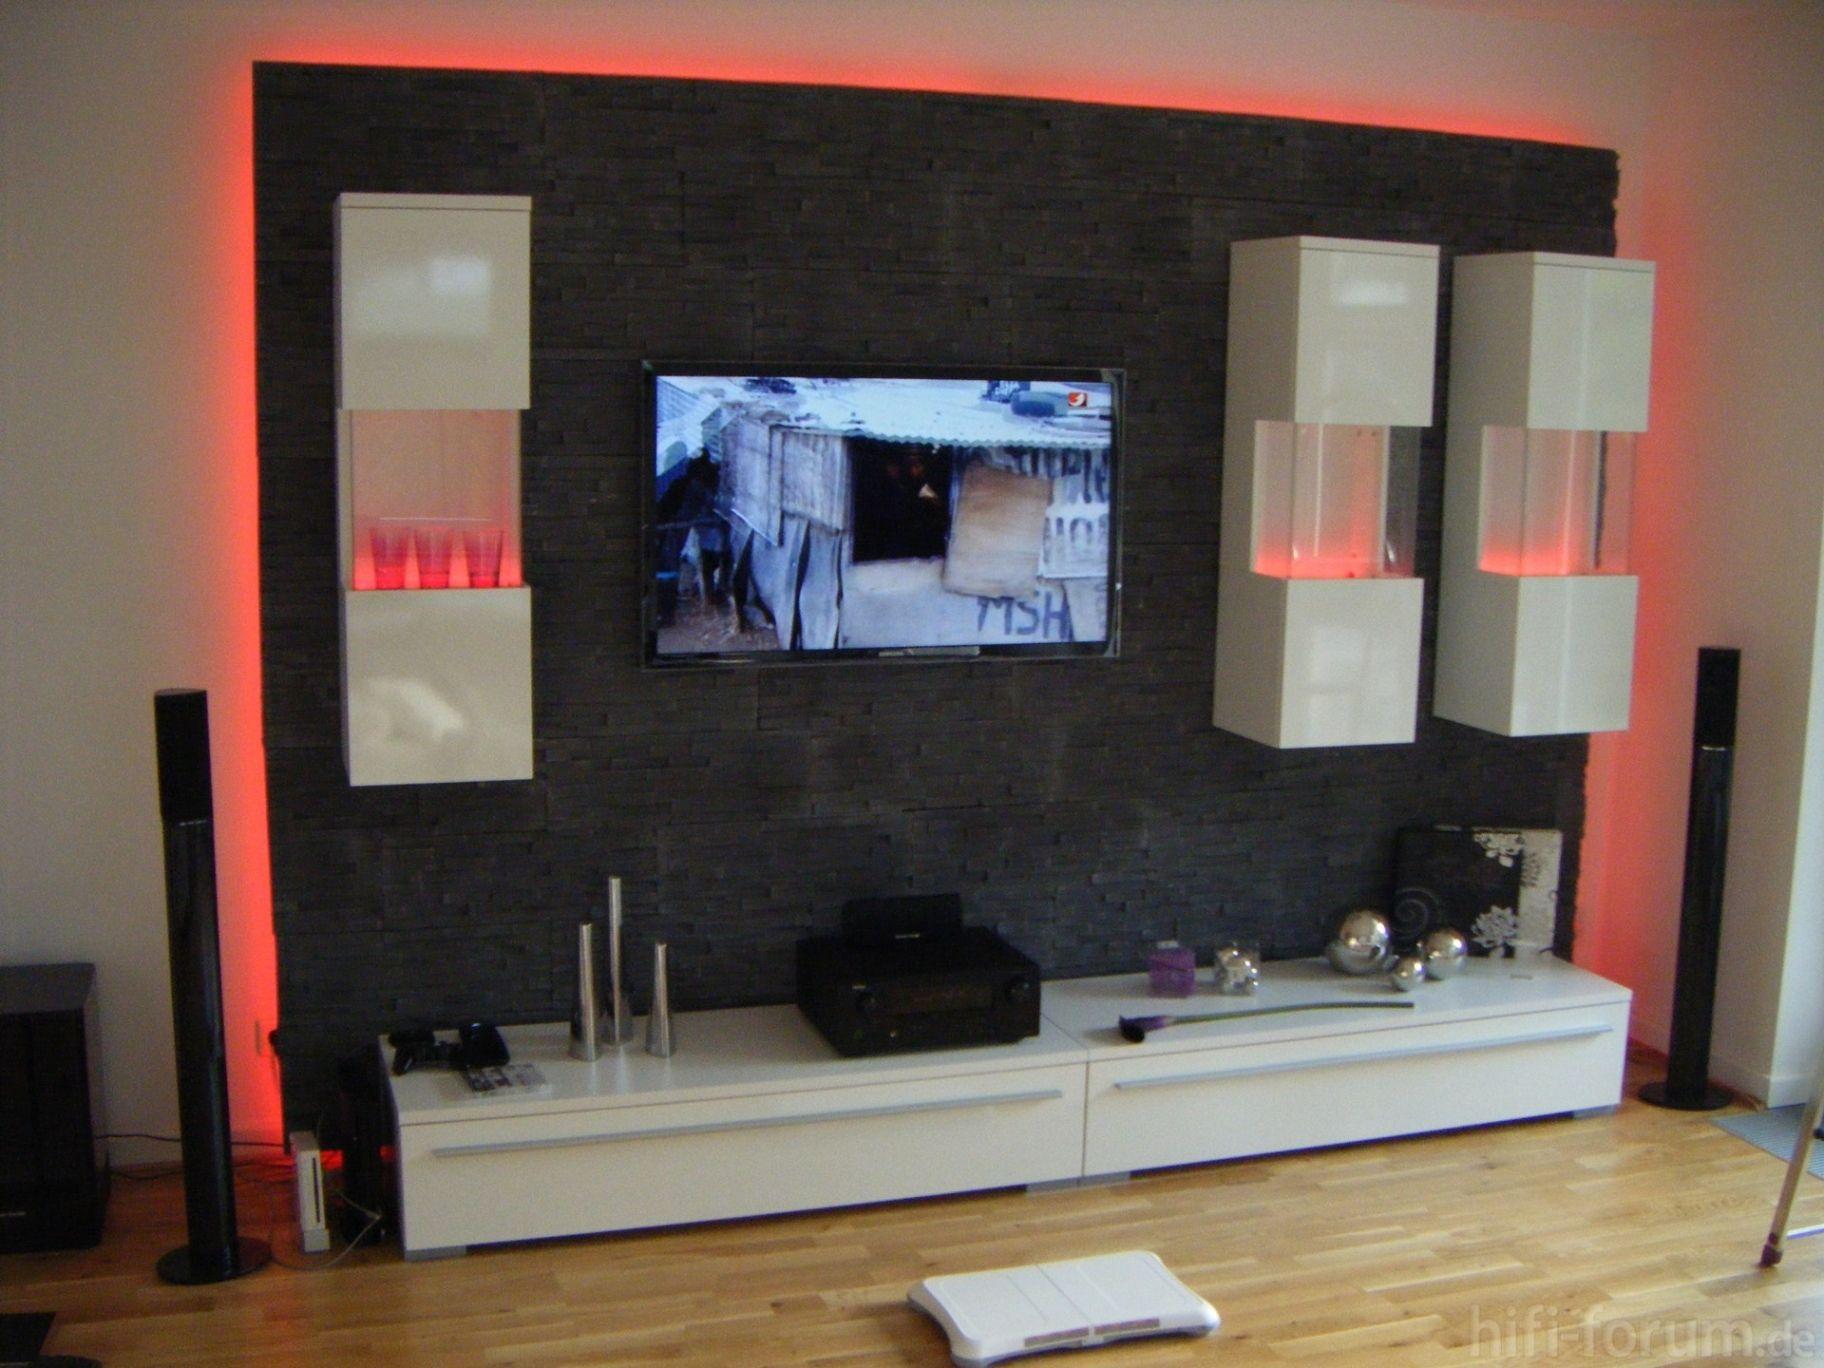 Neu Wohnzimmer Ideen Tv Wand | Wohnwand | Pinterest | TV Wände ...